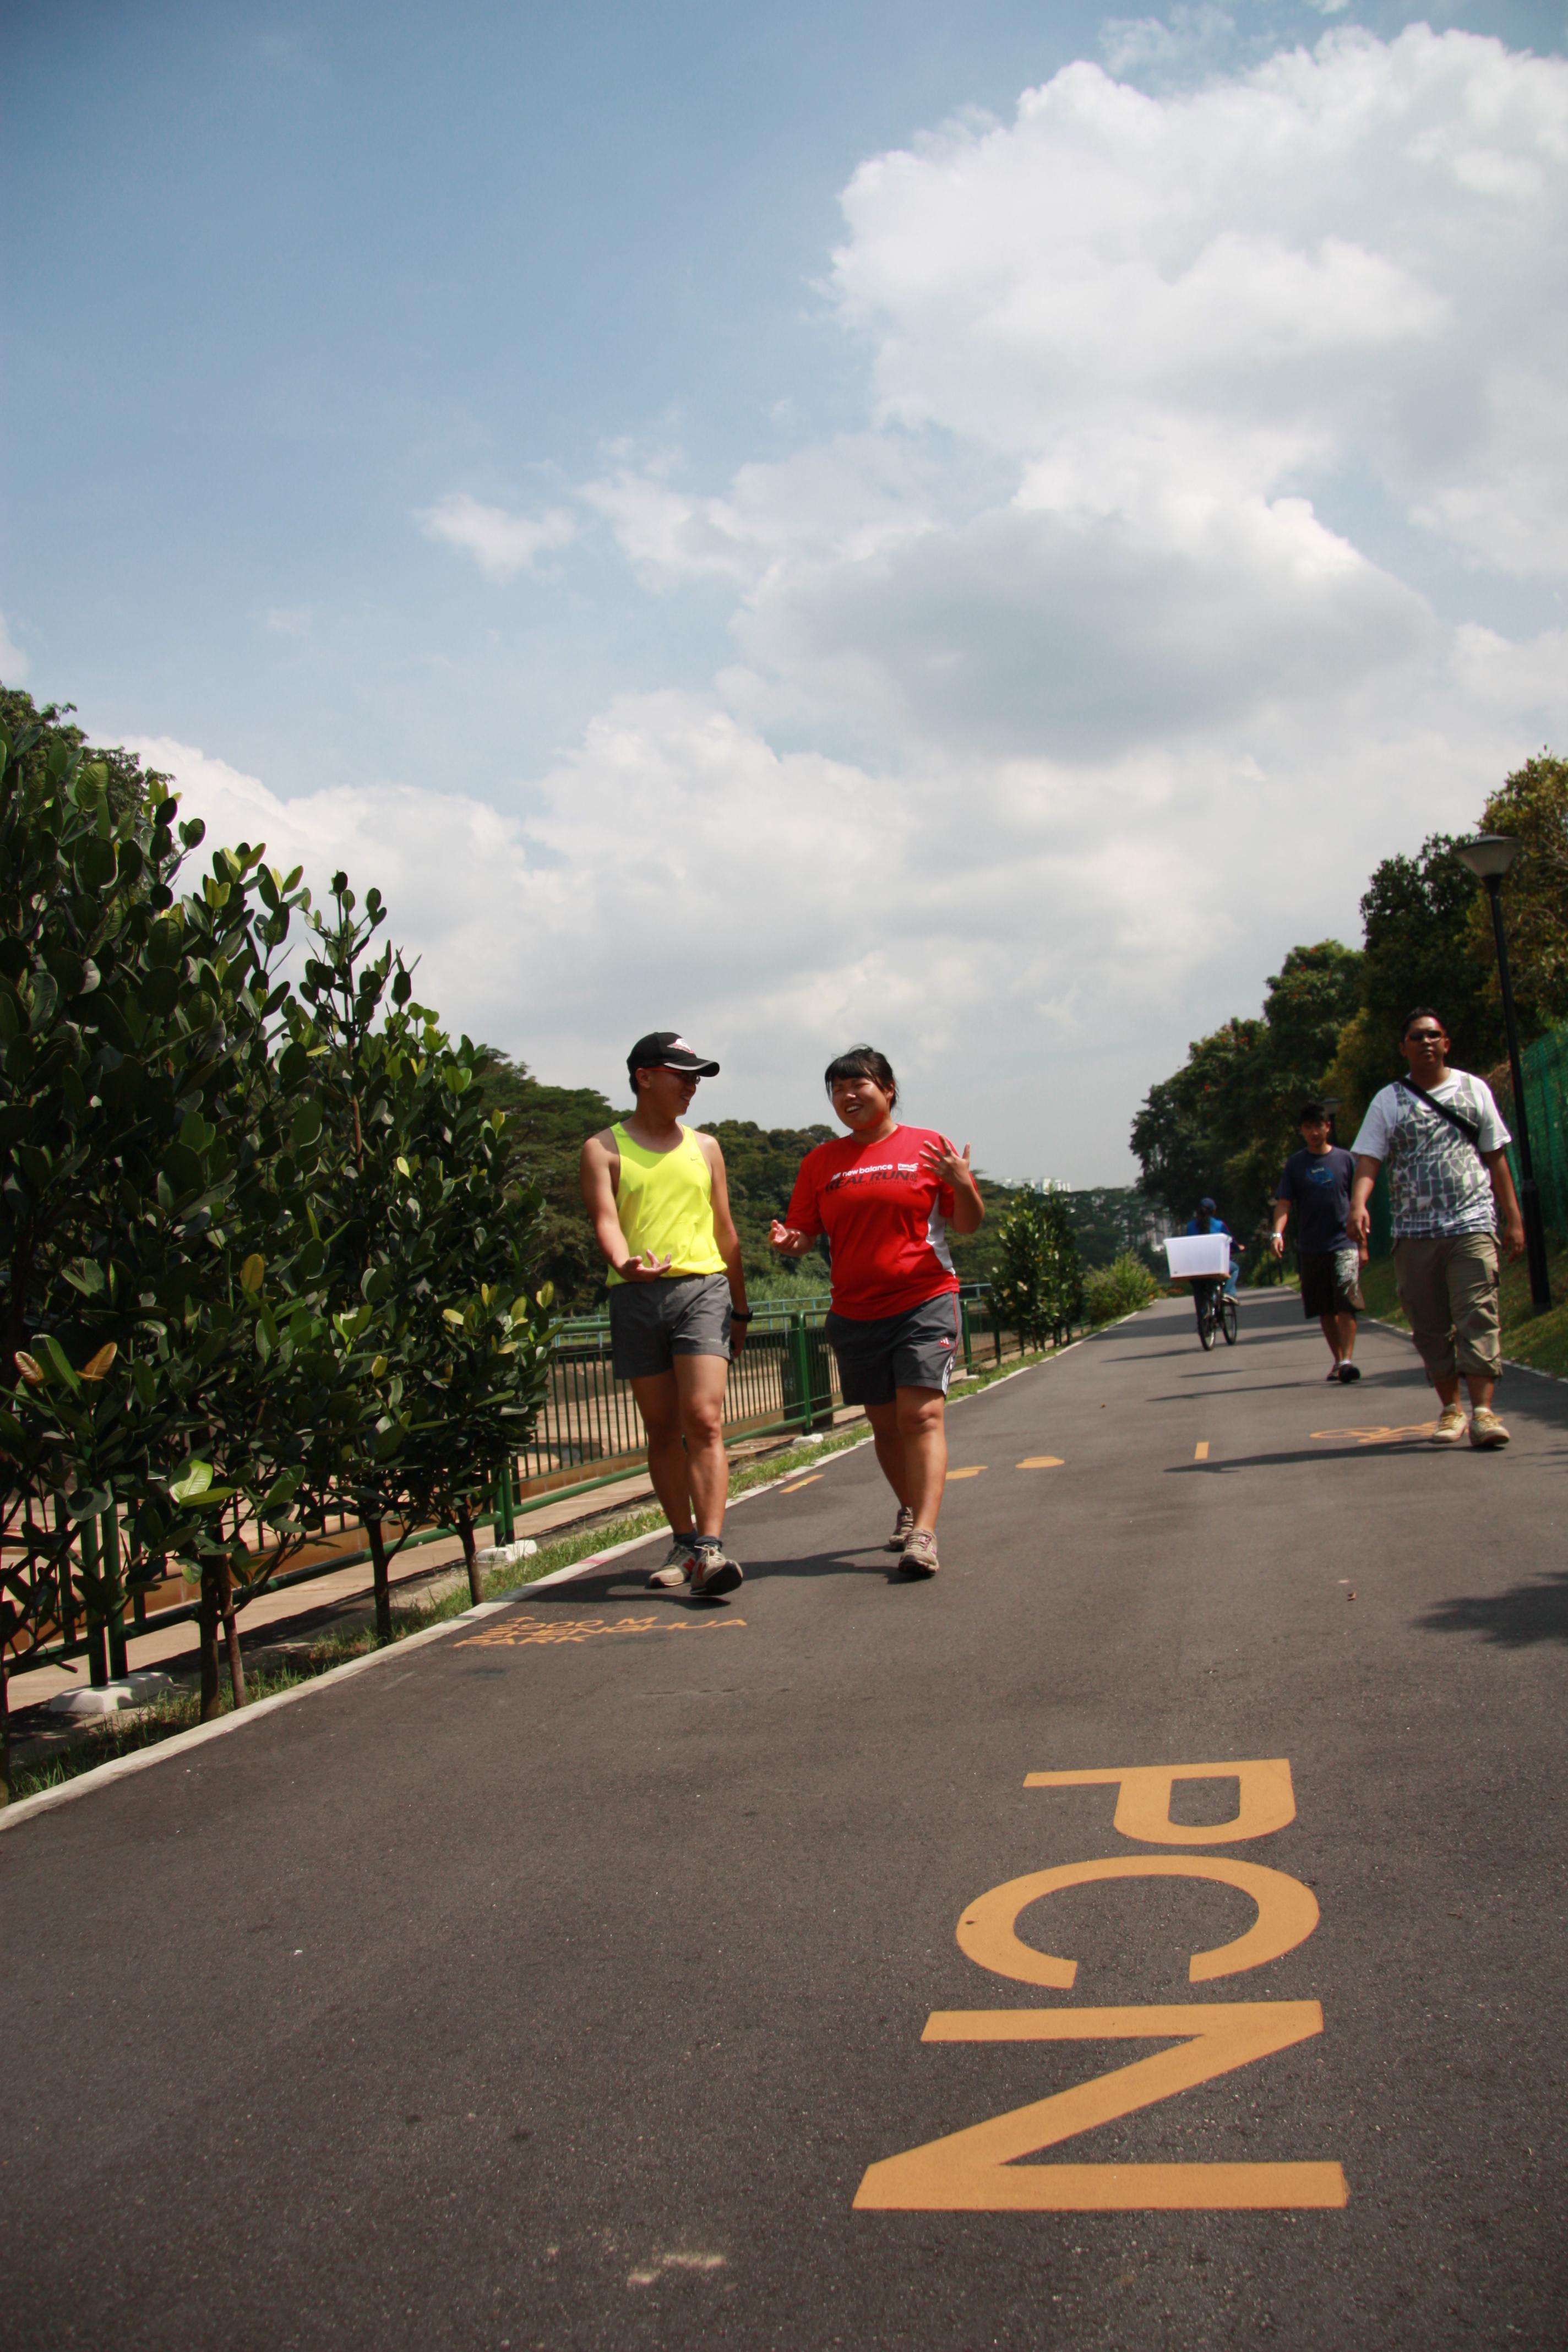 Pang Sua Park Connector - Park Connector Network - Gardens